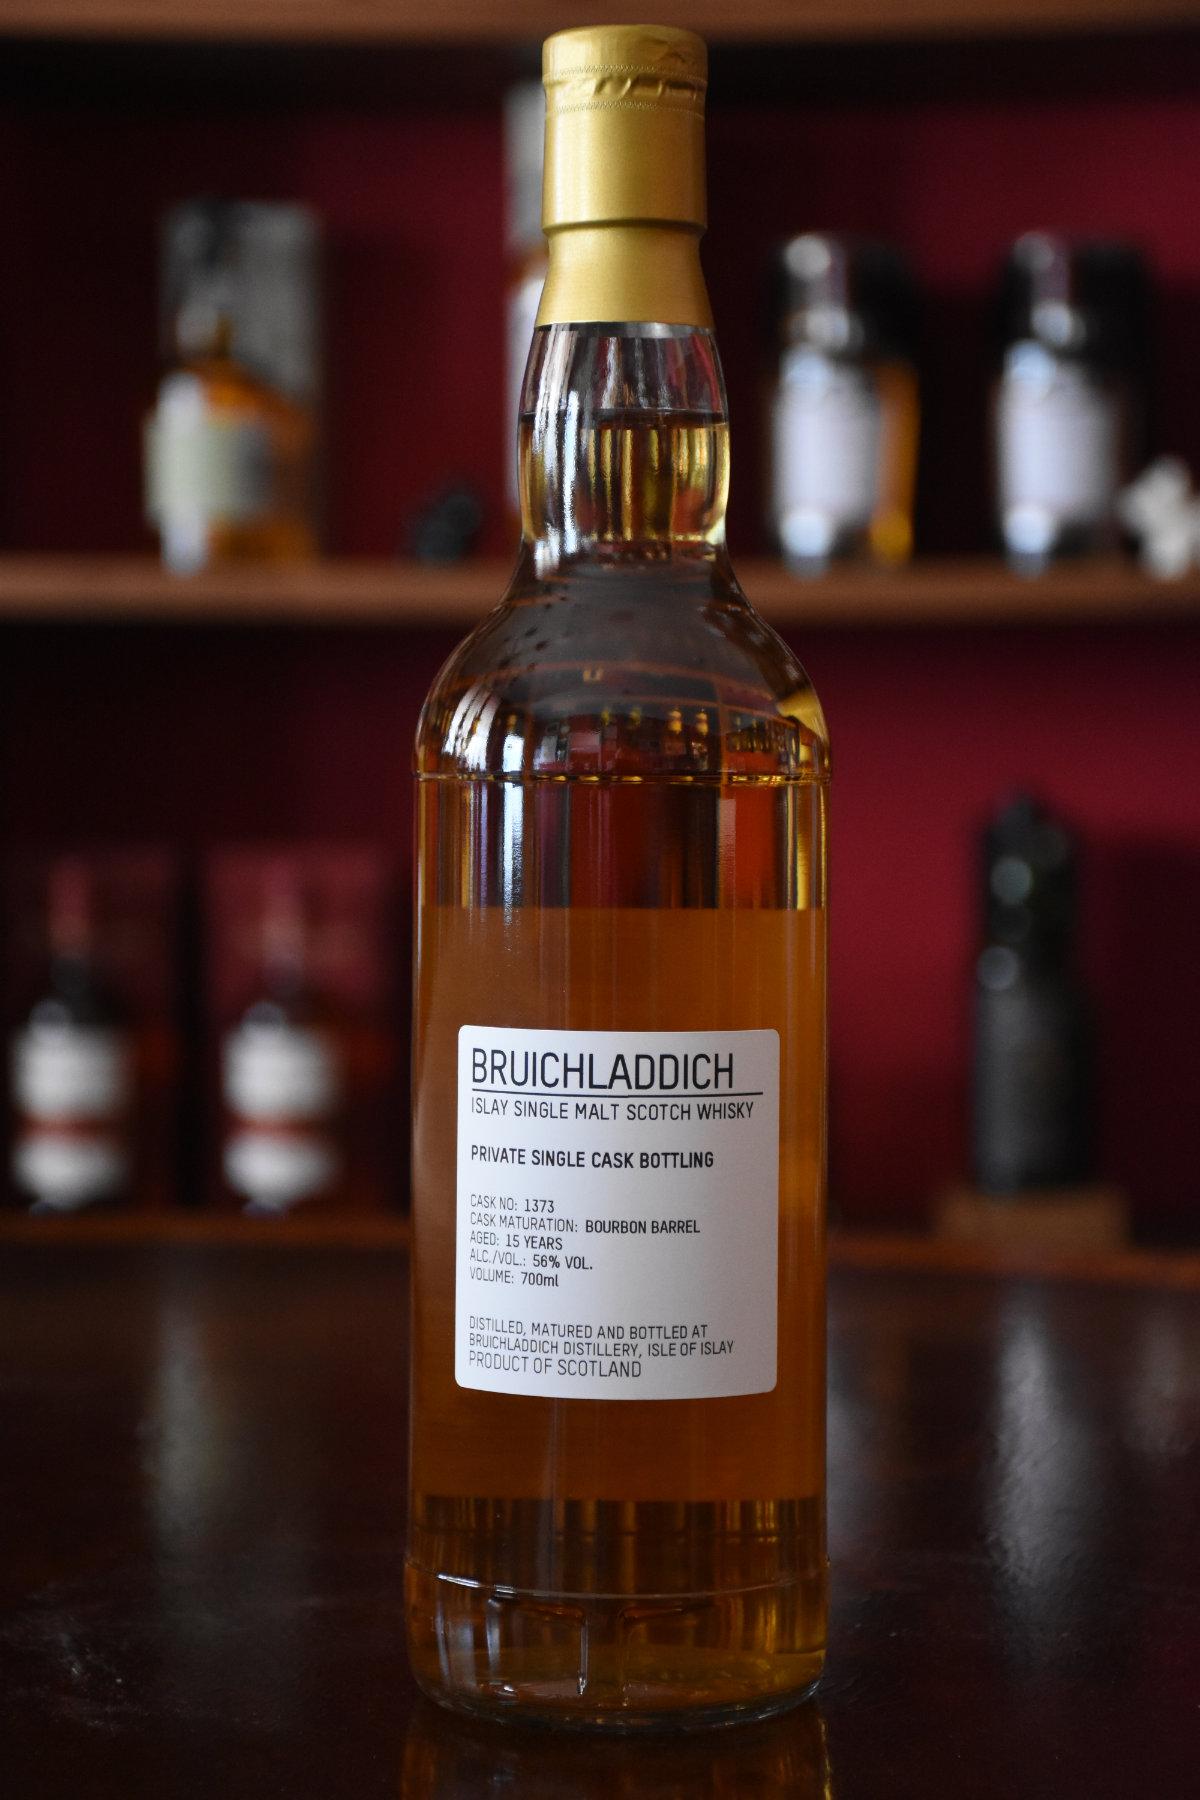 Bruichladdich 2003, Juniperus, 15 Jahre, Bourbon Cask, 56% Alc.Vol., Islay Cask Company